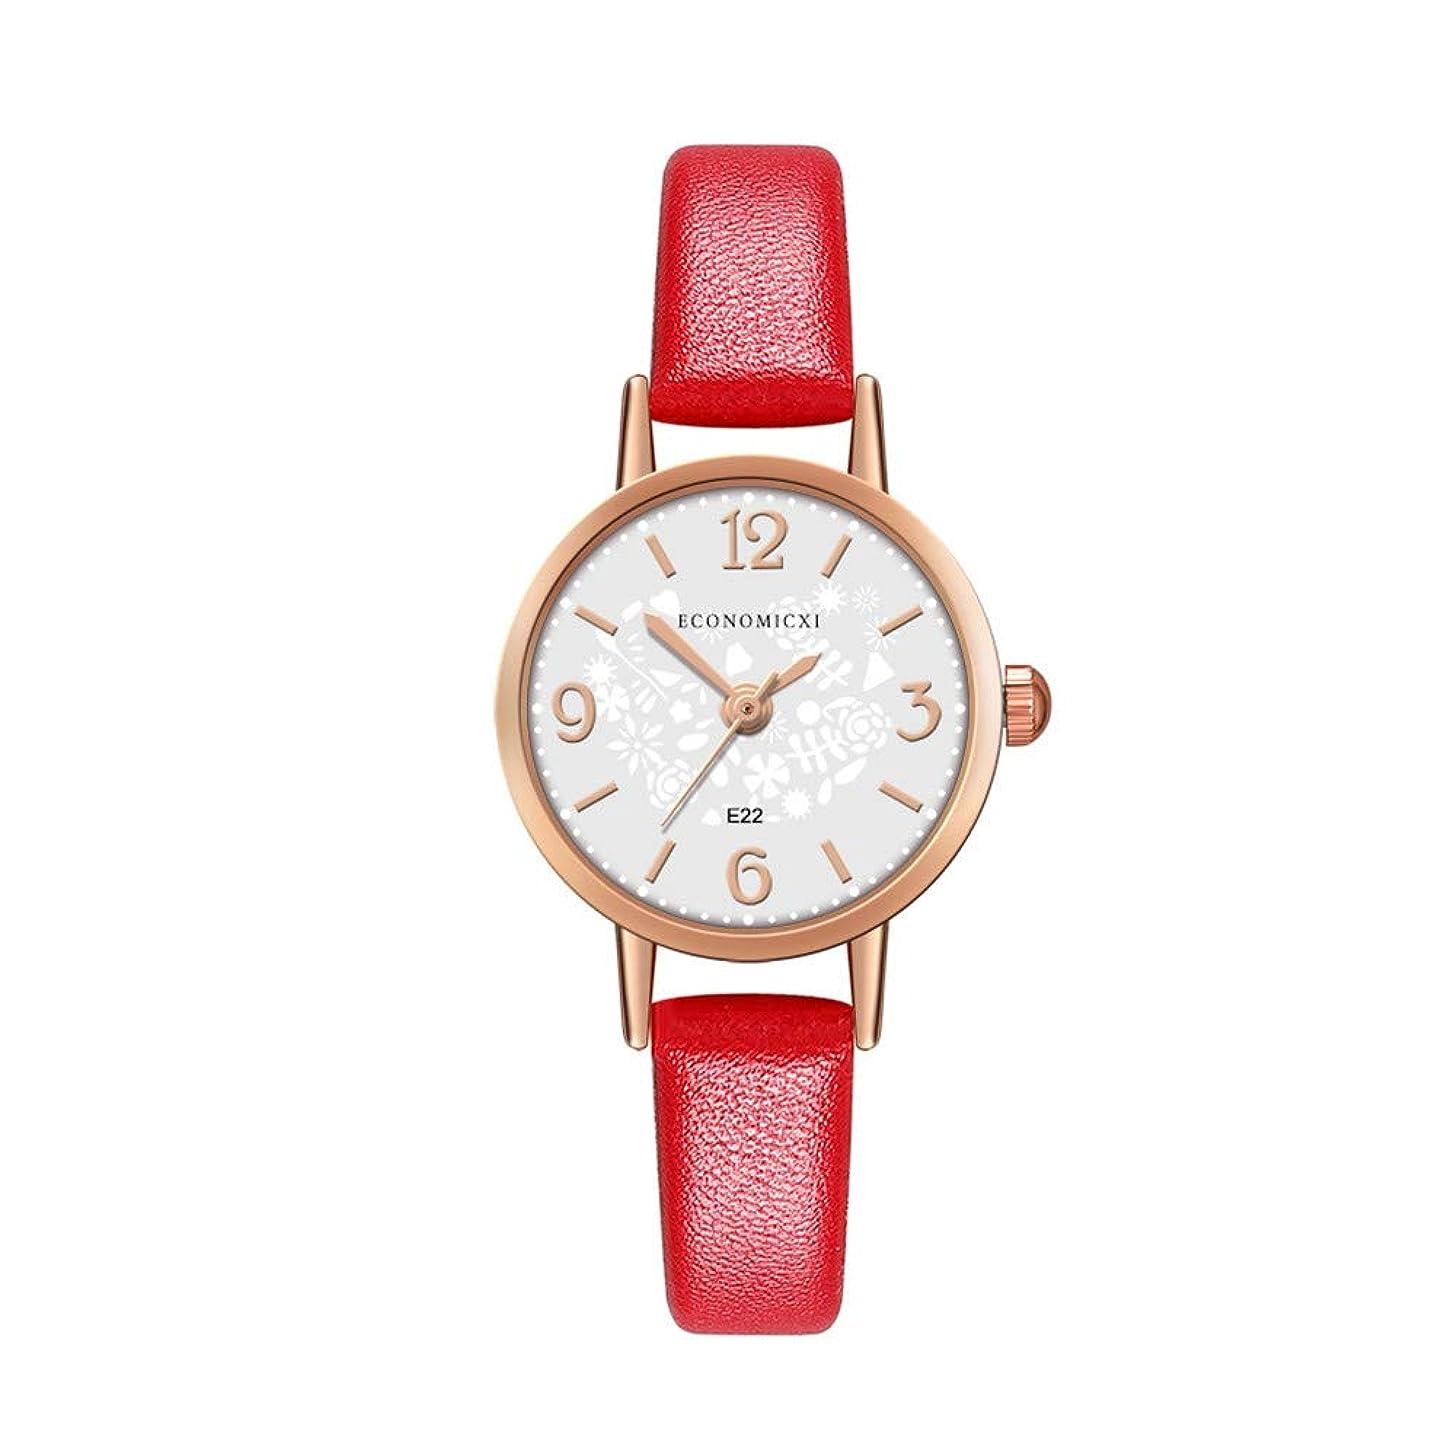 Fashion Women's Watch Digital Design Dial Leather Bands Casual Analog Quartz Wristwatch